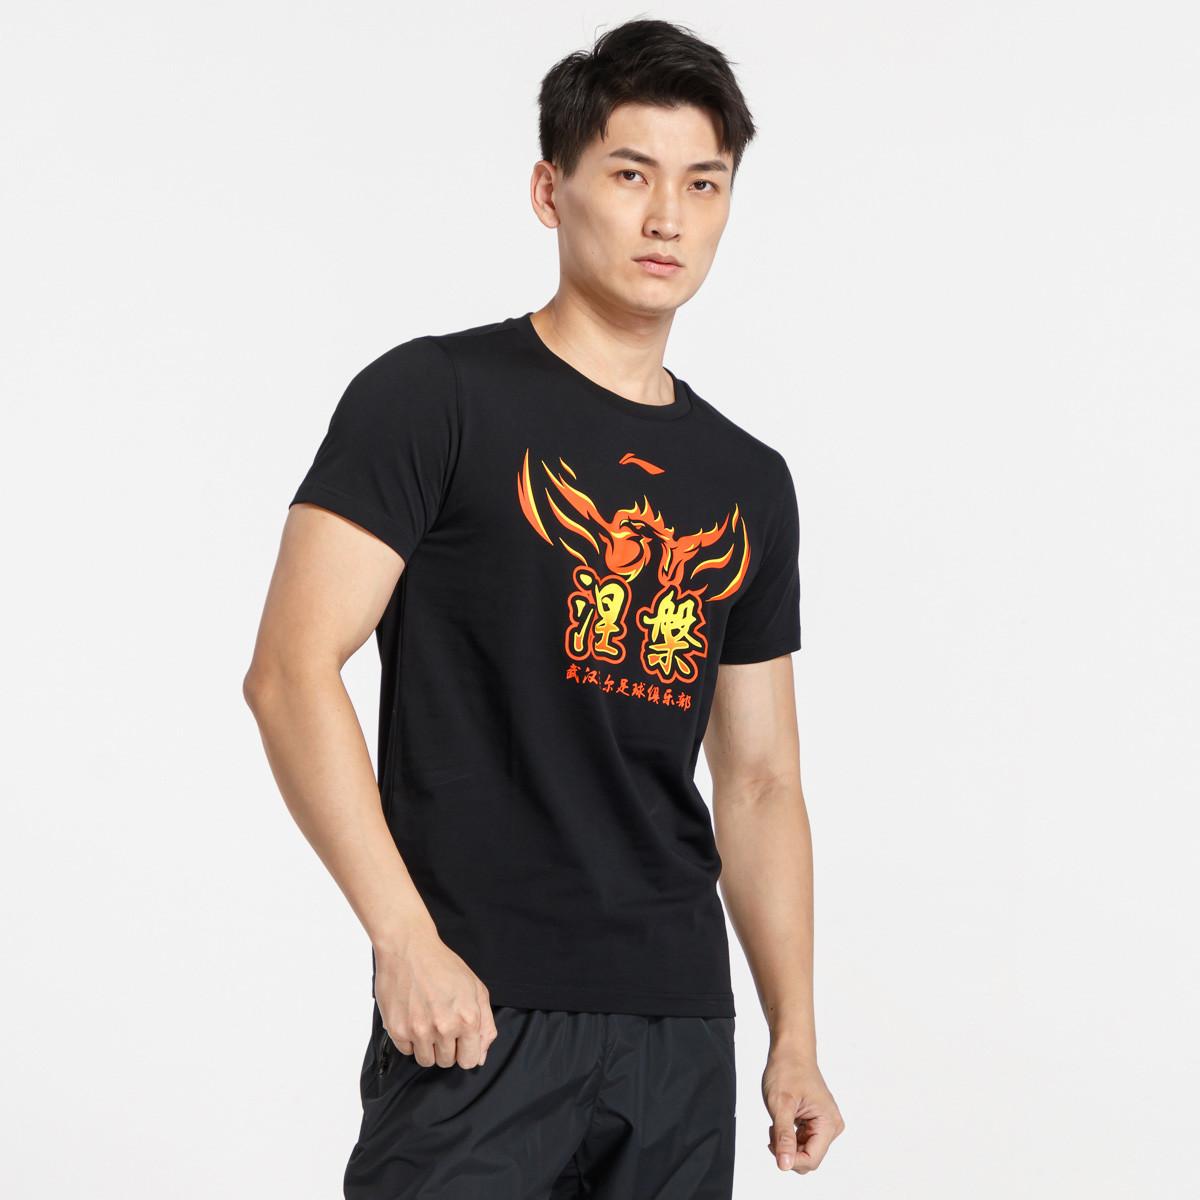 LI-NING 李宁 AHSN969 男士T恤